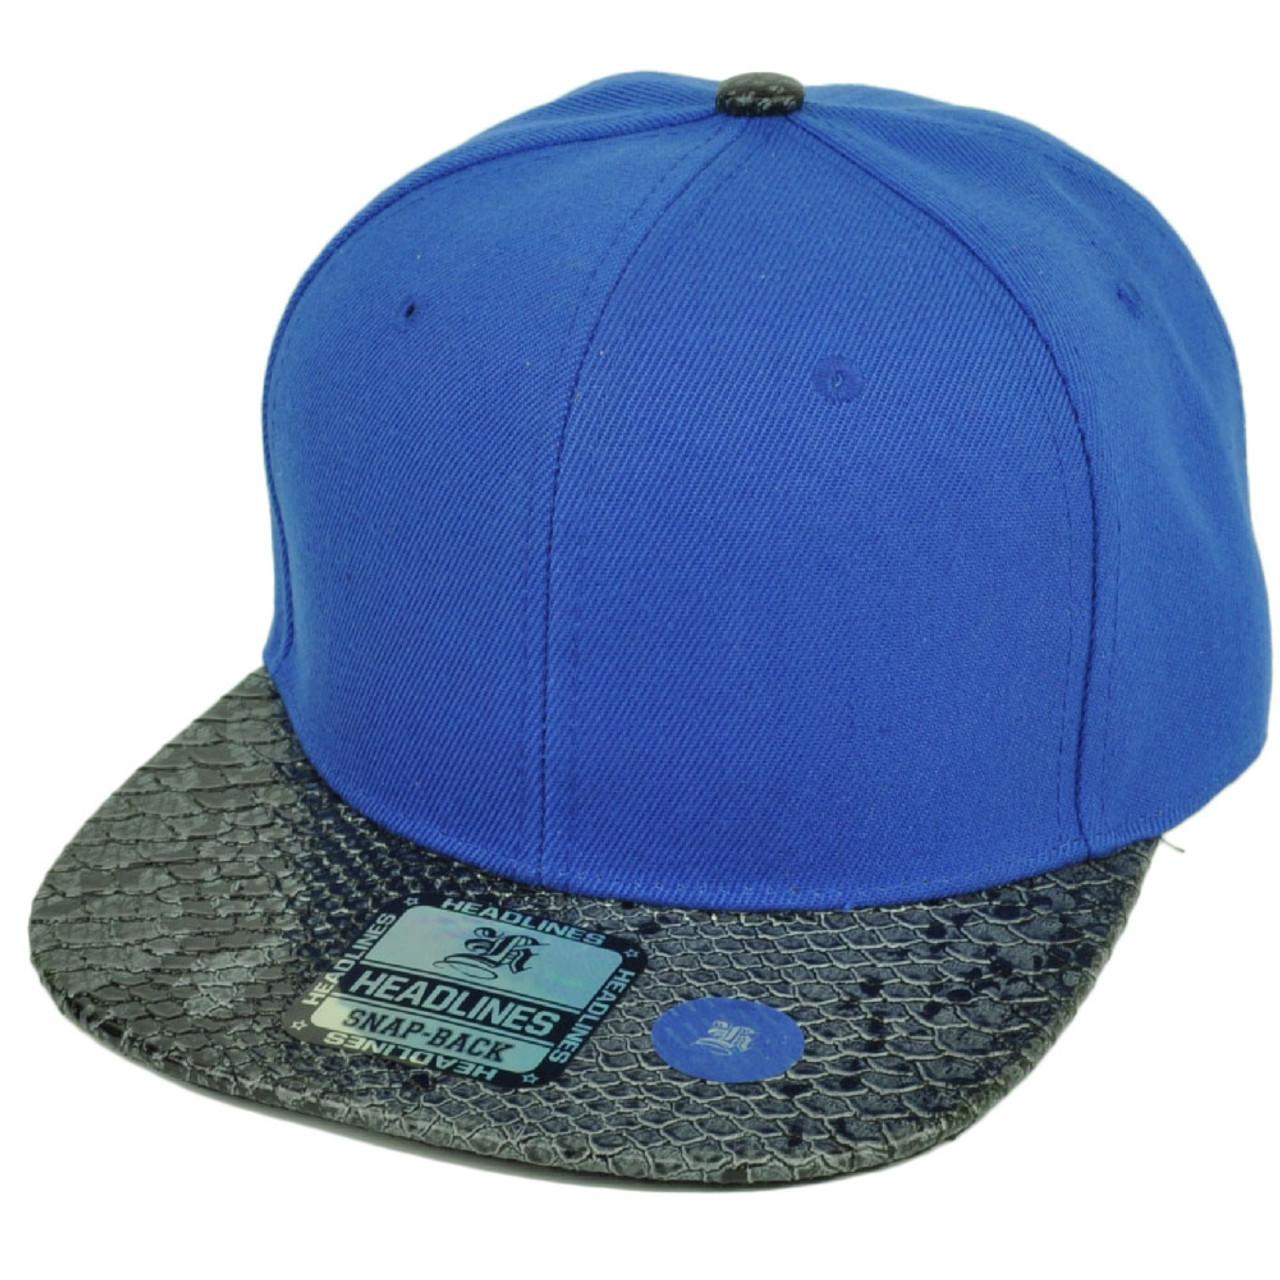 1cf04dad Blank Snapback Flat Bill Brim Hat Cap Snake Skin Pattern Visor Royal Blue  Mens - Cap Store Online.com